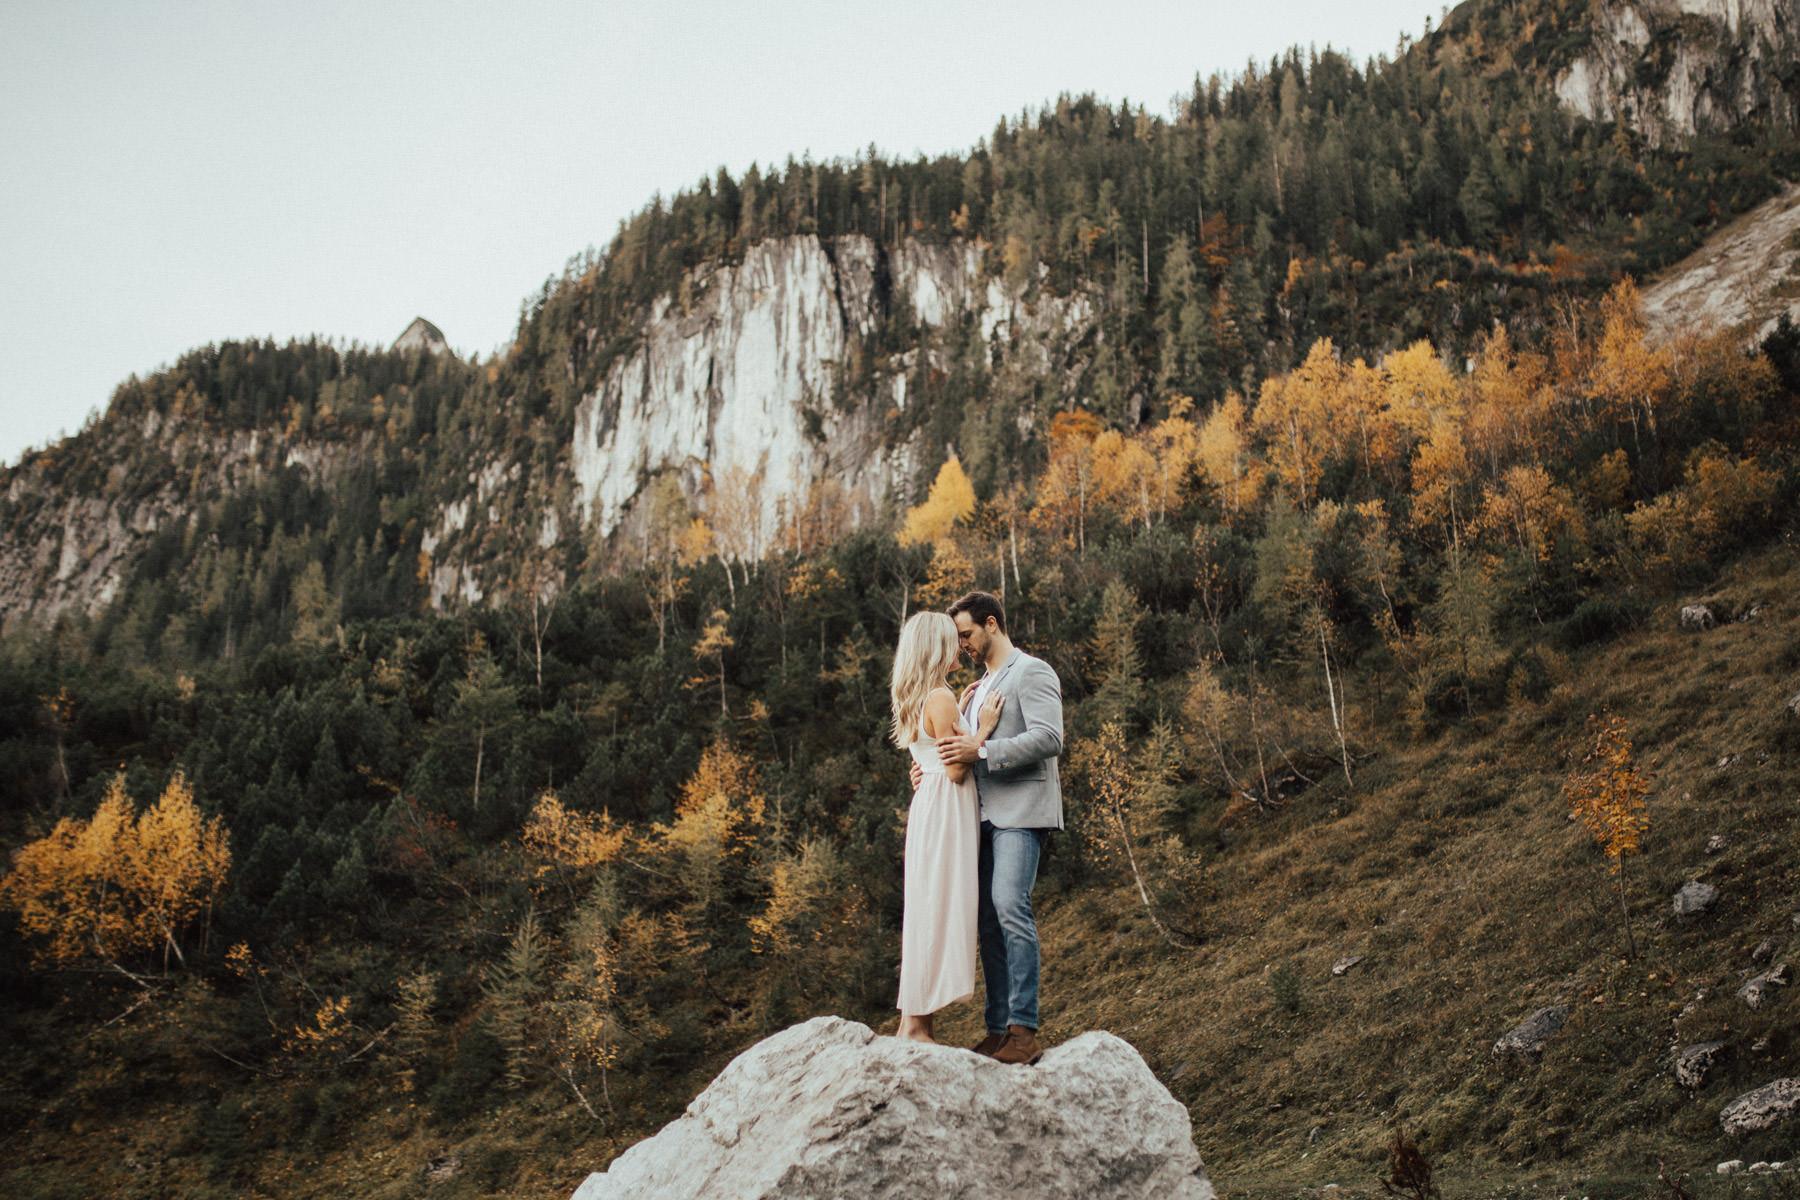 posierendes Paar vor imposanter Landschaft